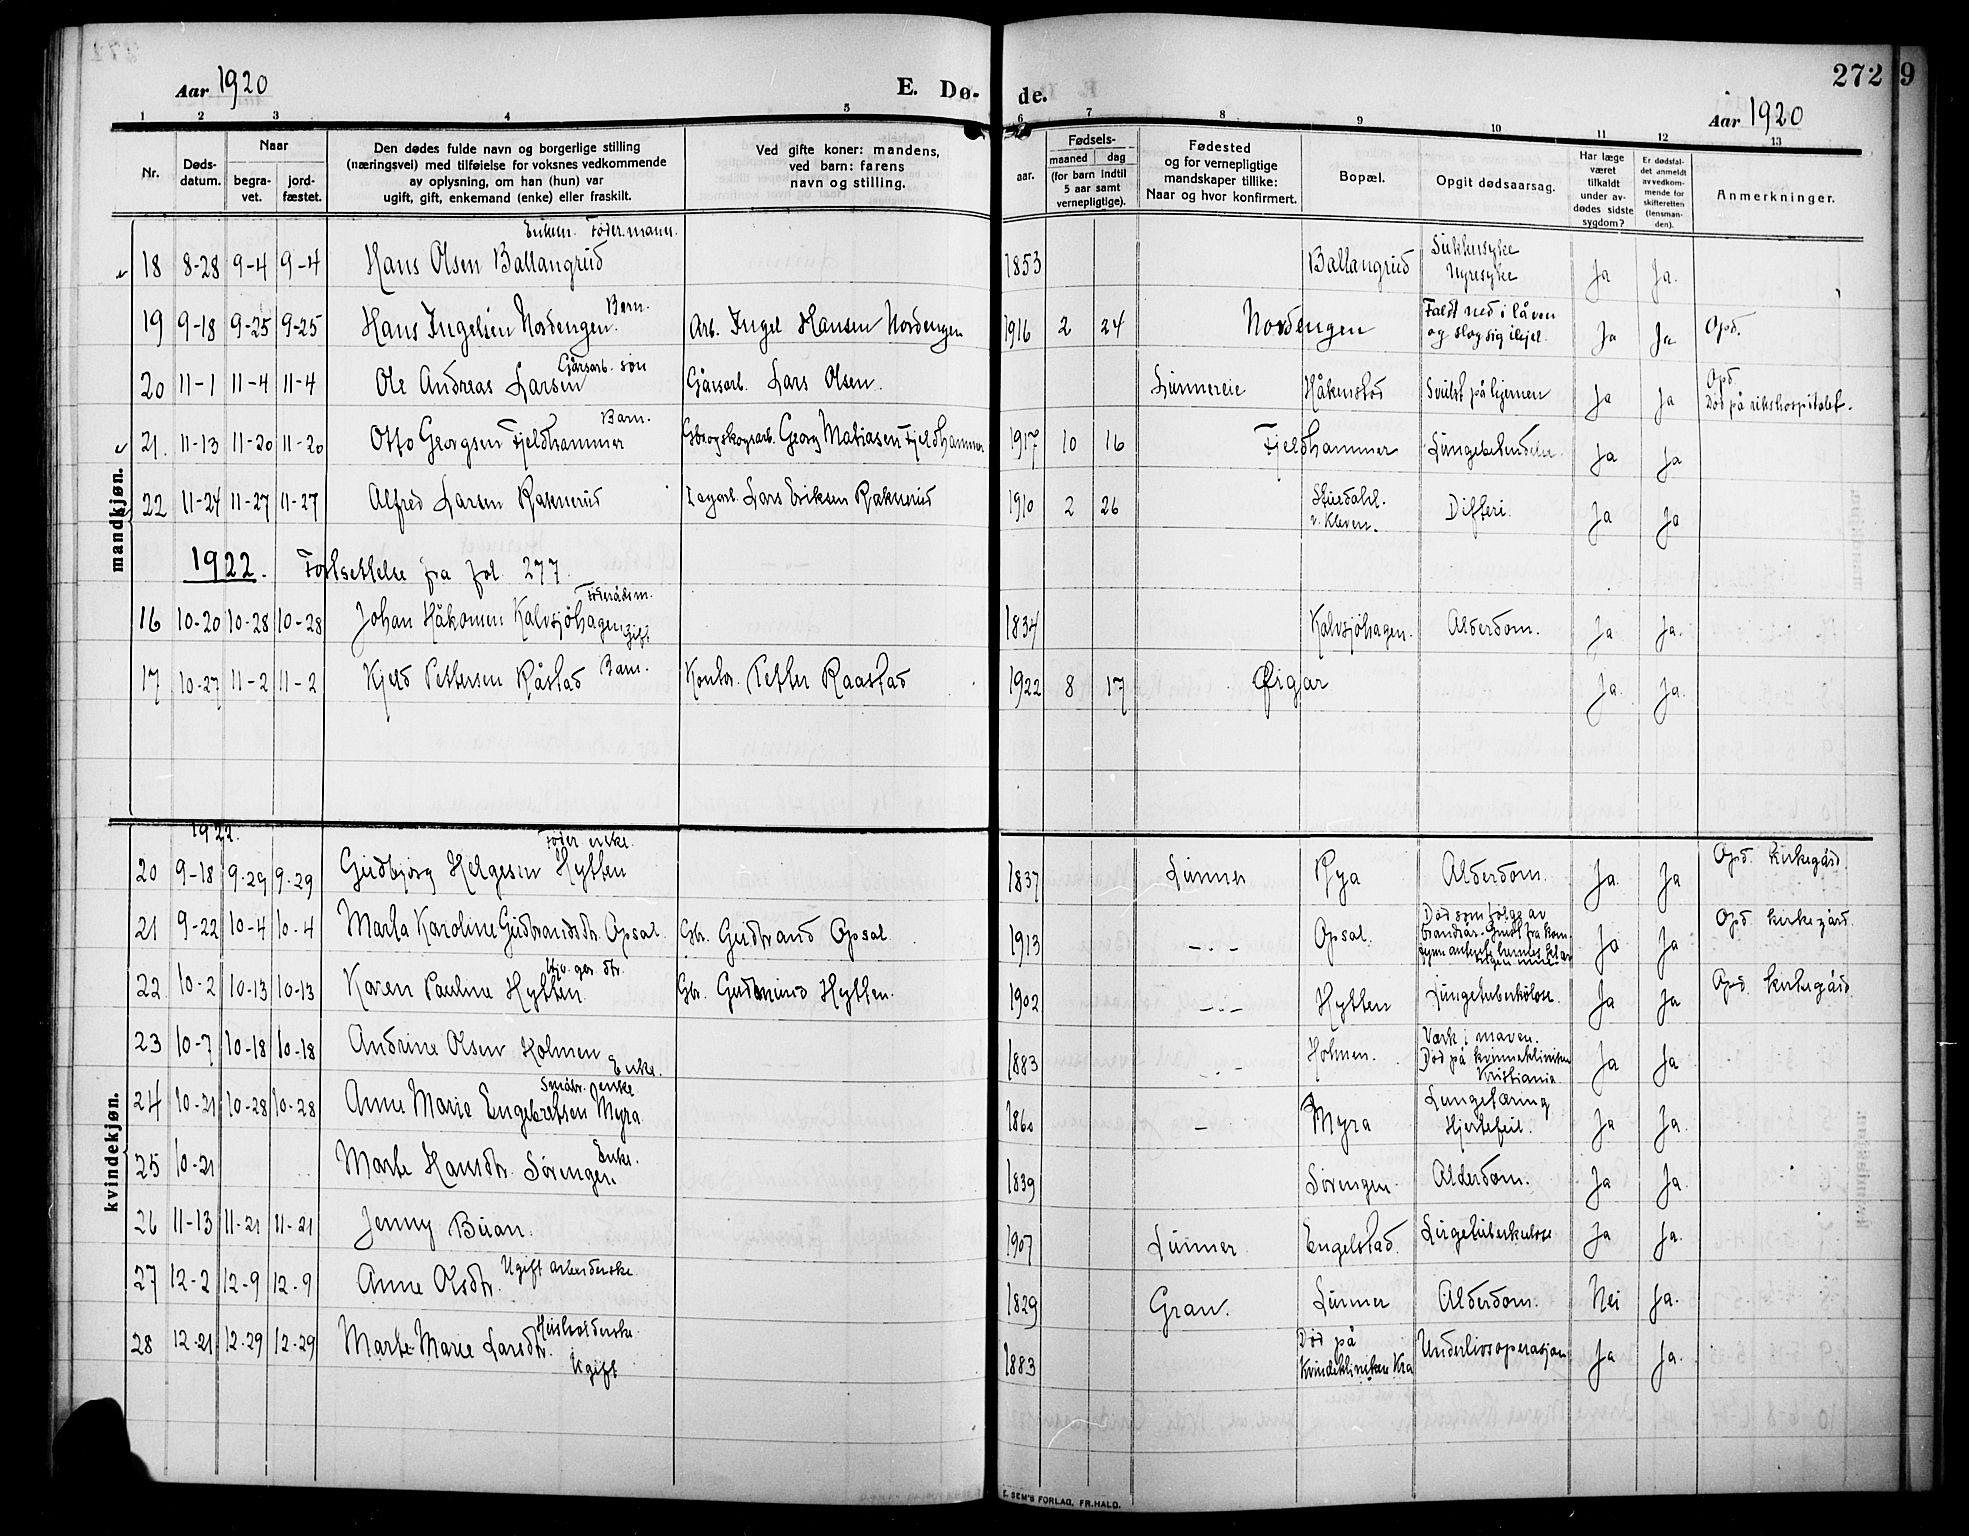 SAH, Lunner prestekontor, H/Ha/Hab/L0001: Klokkerbok nr. 1, 1909-1922, s. 272